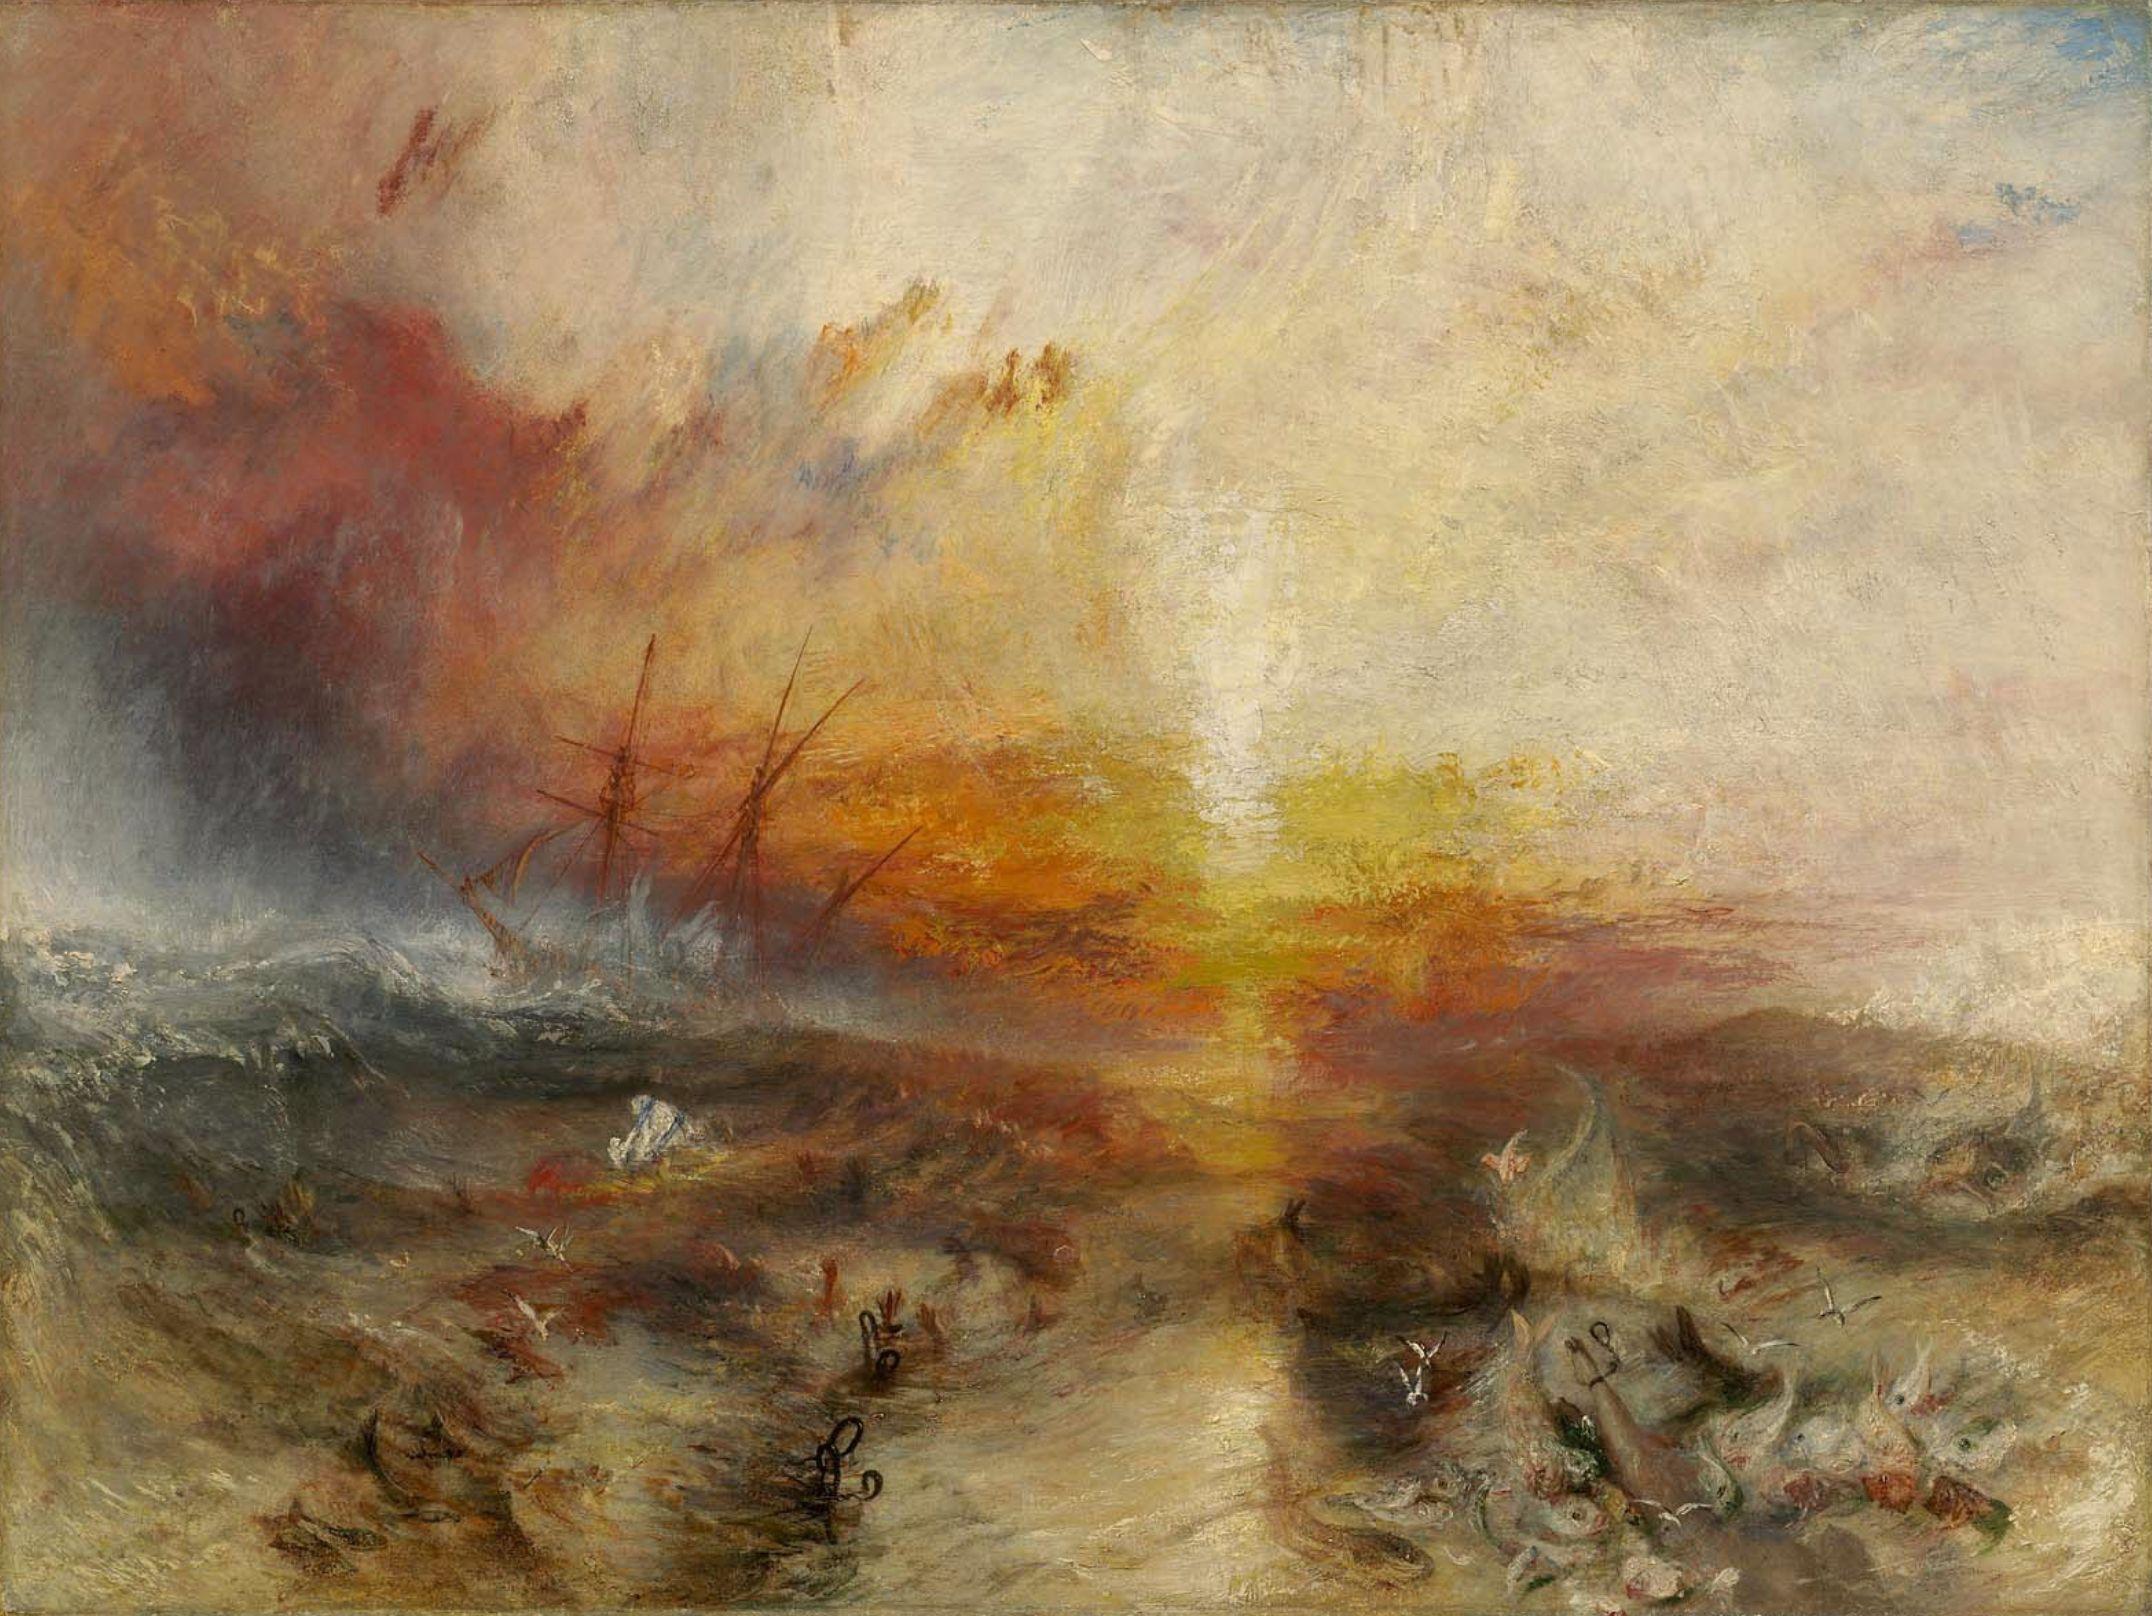 [Turner Slave Ship]